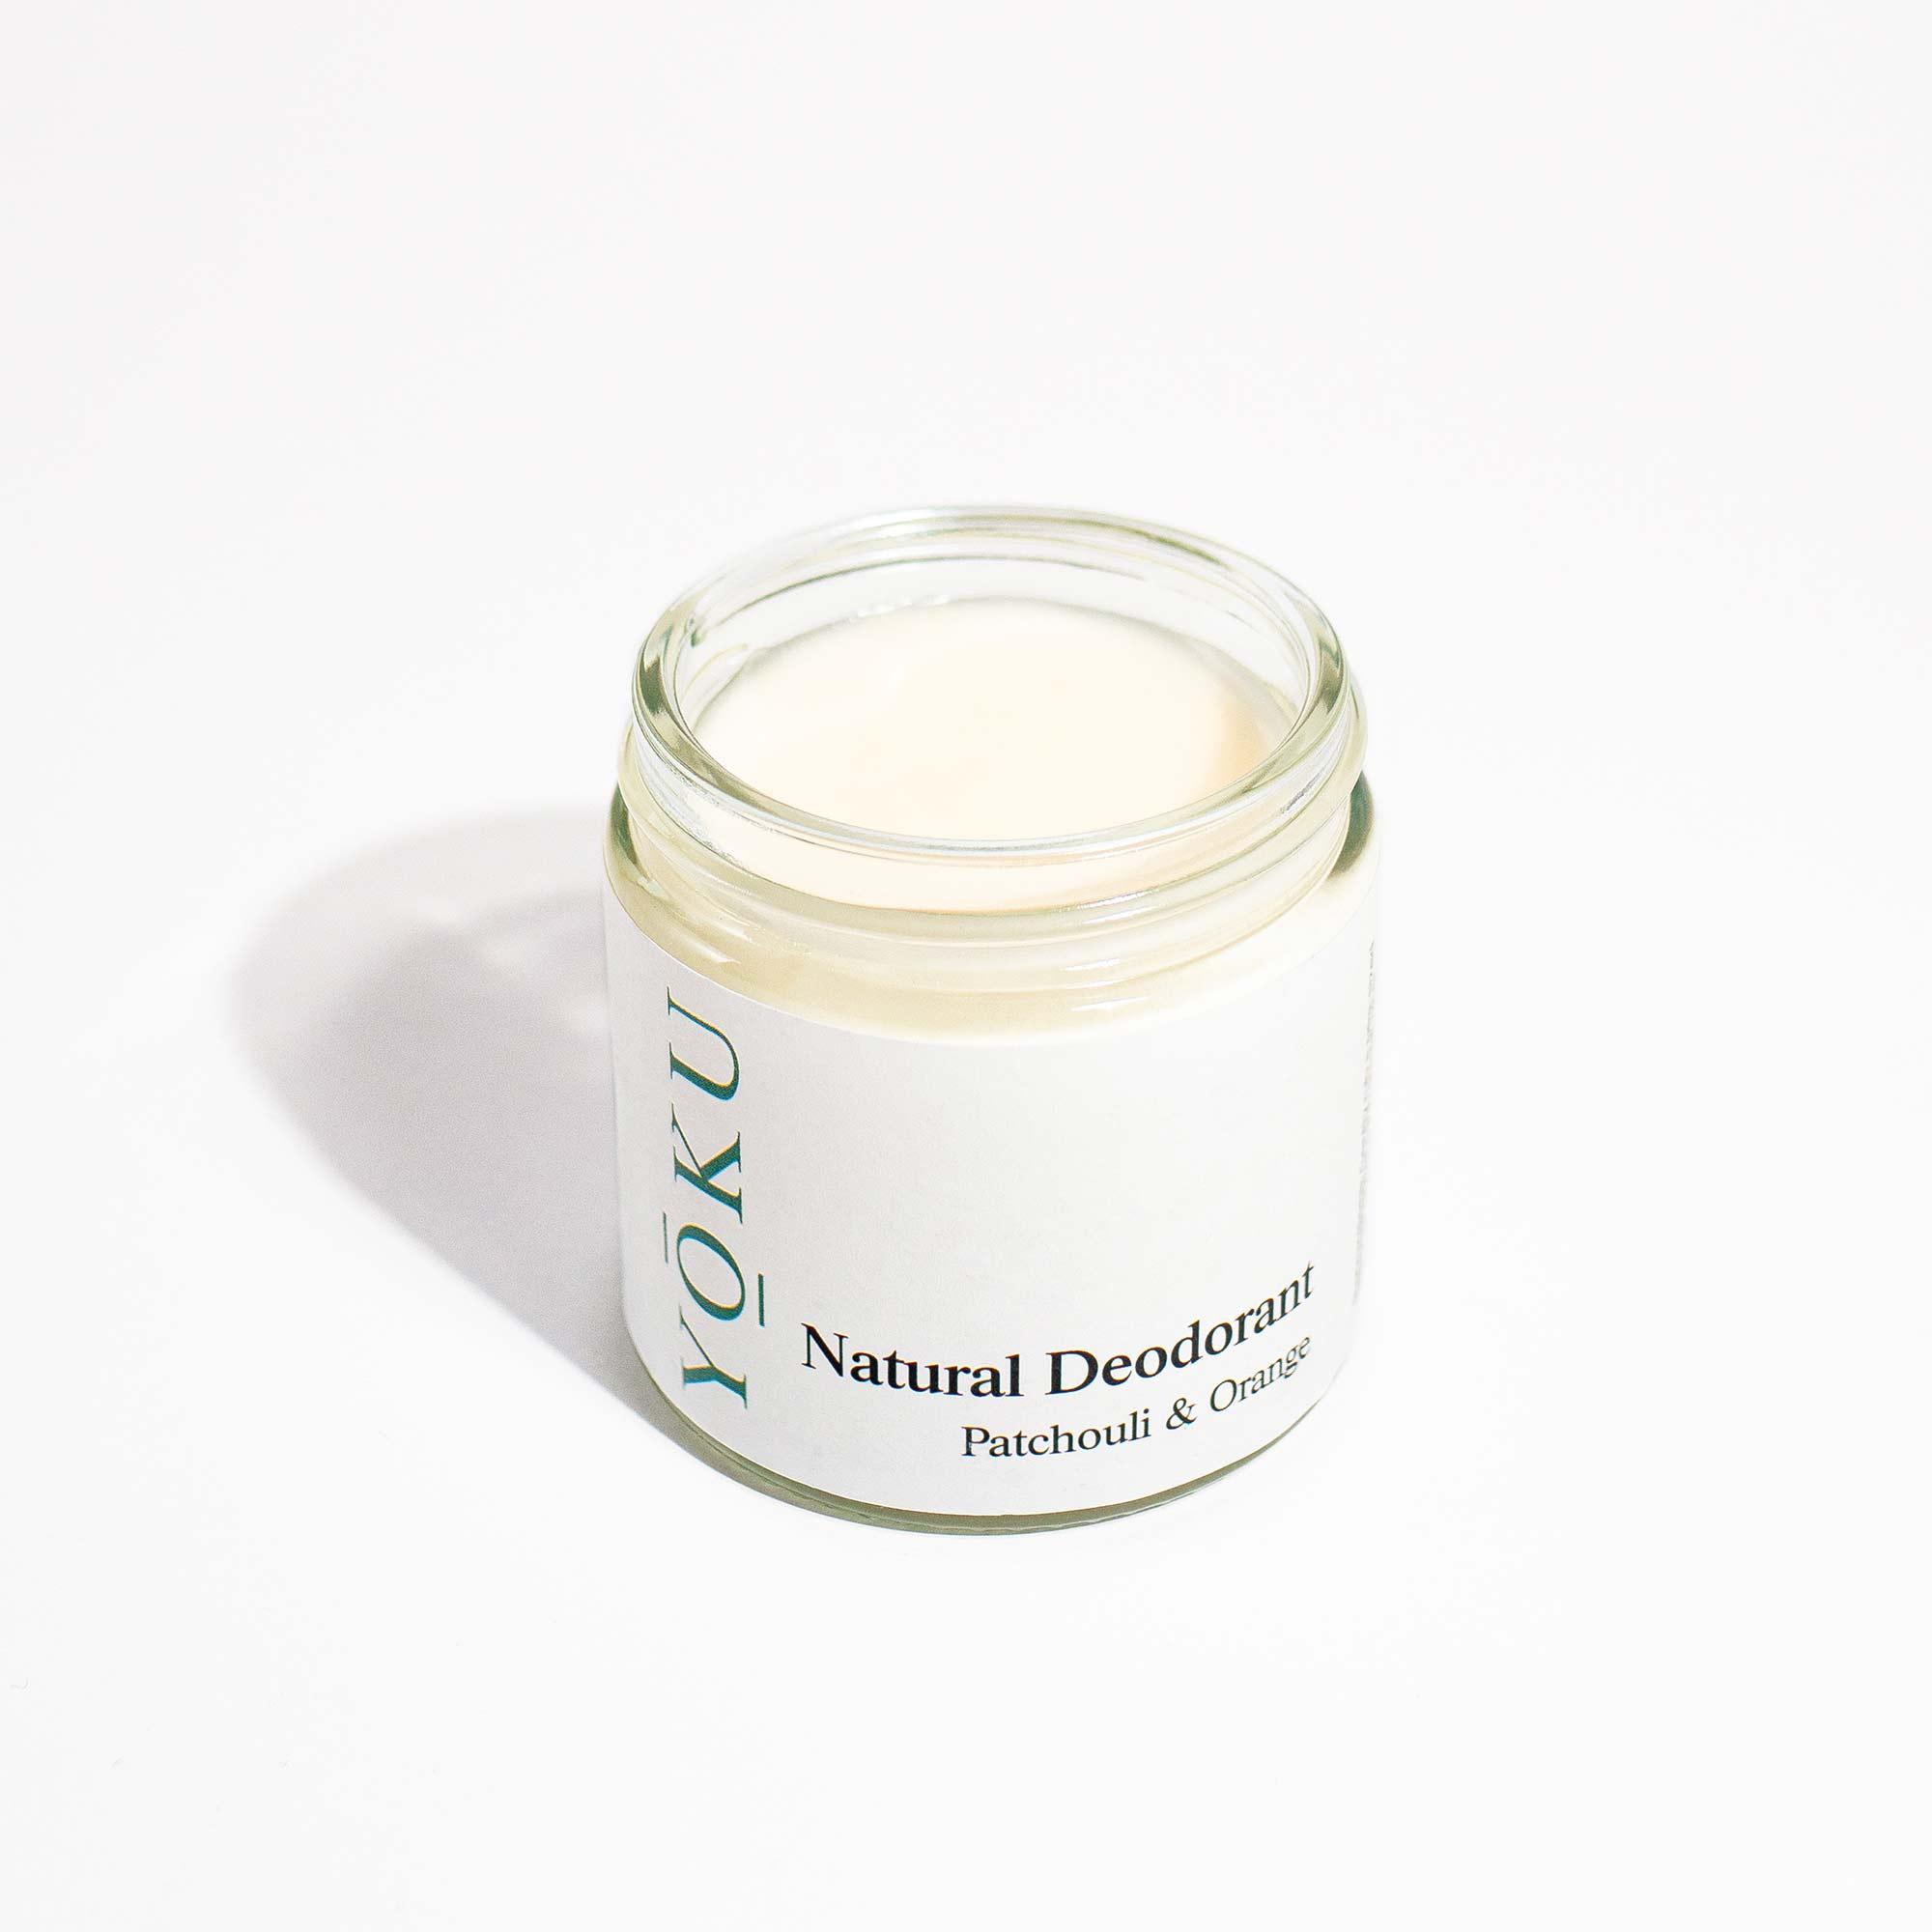 YOKU Natural Deodorants - Patchouli & Orange 2